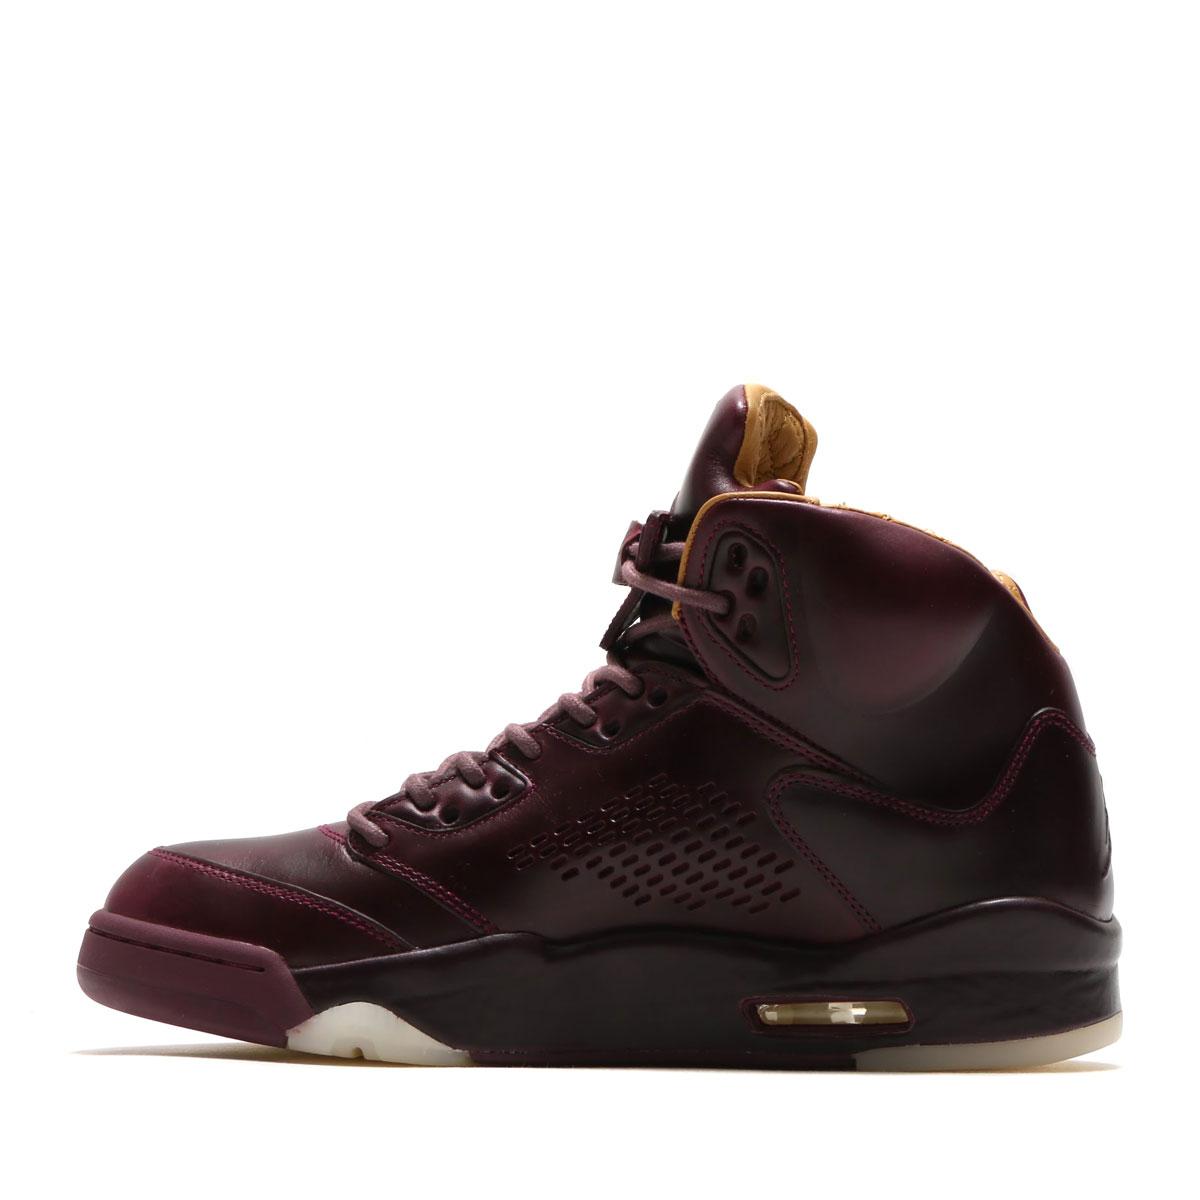 new style ca364 e95b5 NIKE AIR JORDAN 5 RETRO PREM (Nike Air Jordan 5 nostalgic premium) (BORDEAUX  BORDEAUX-SAIL-ELEMENTAL GOLD) 17HO-S